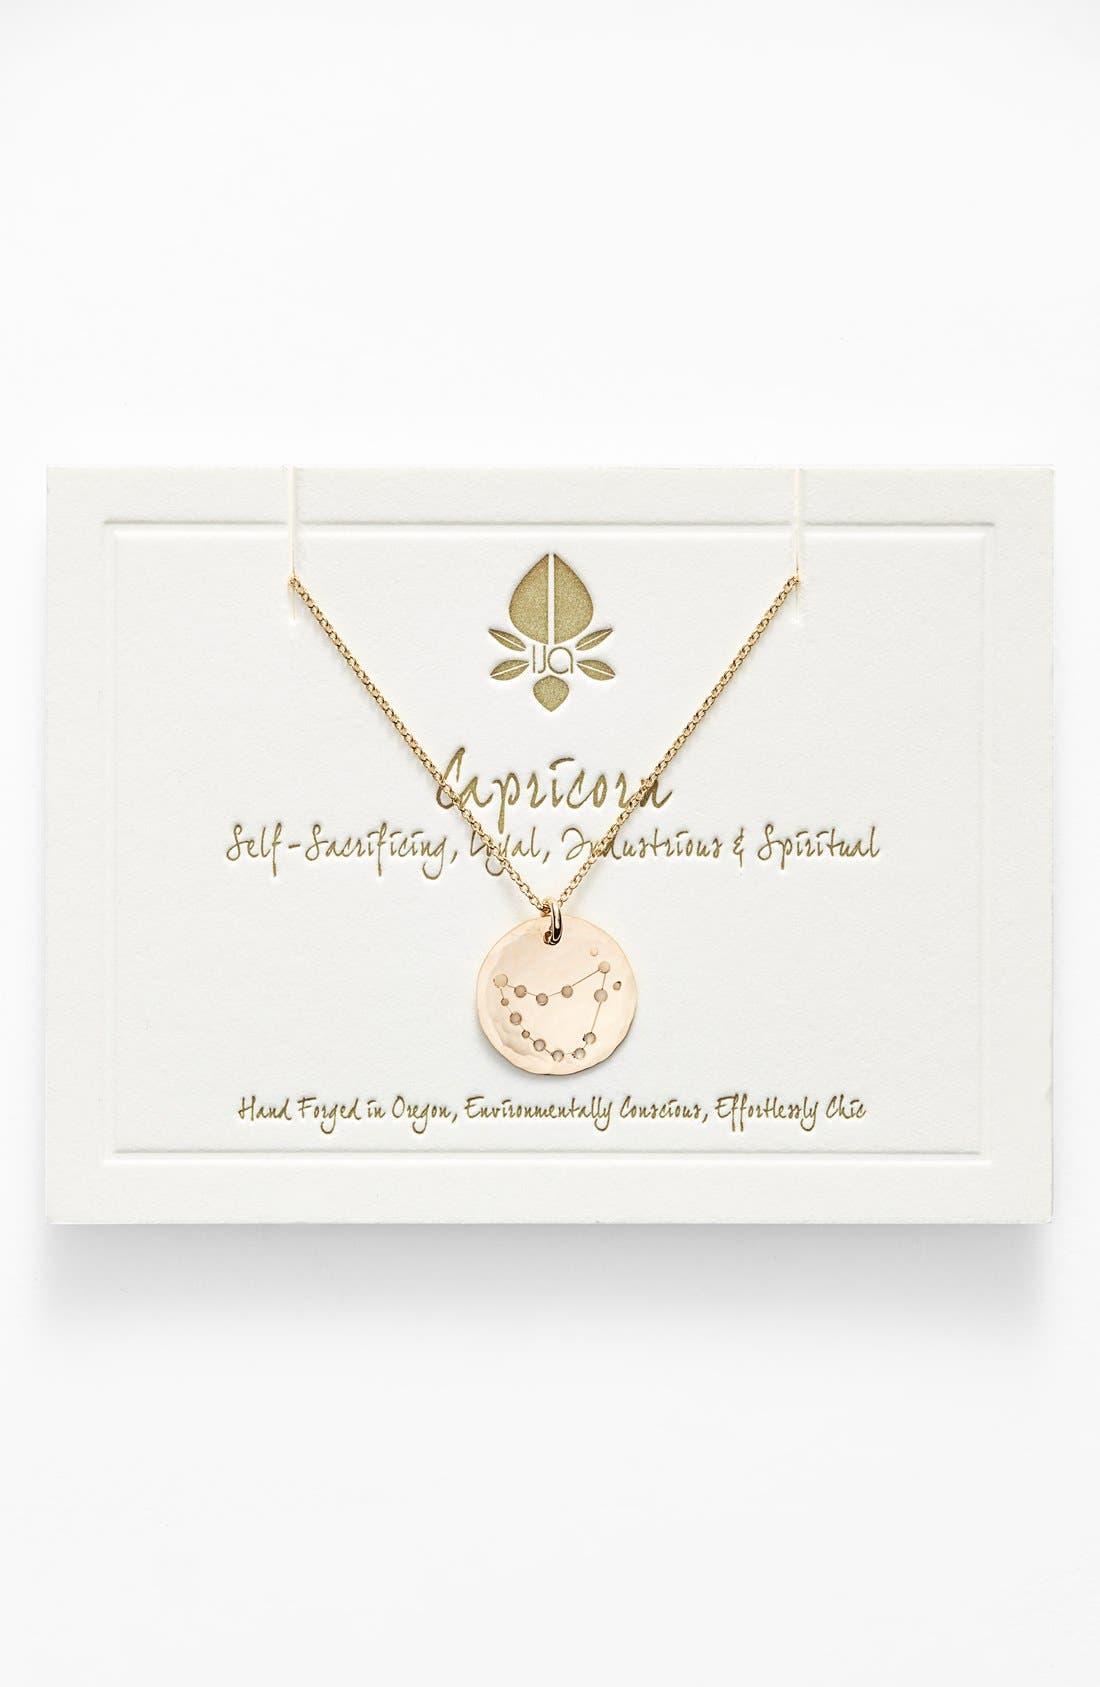 Ija 'Small Zodiac' 14k-Gold Fill Necklace,                             Main thumbnail 10, color,